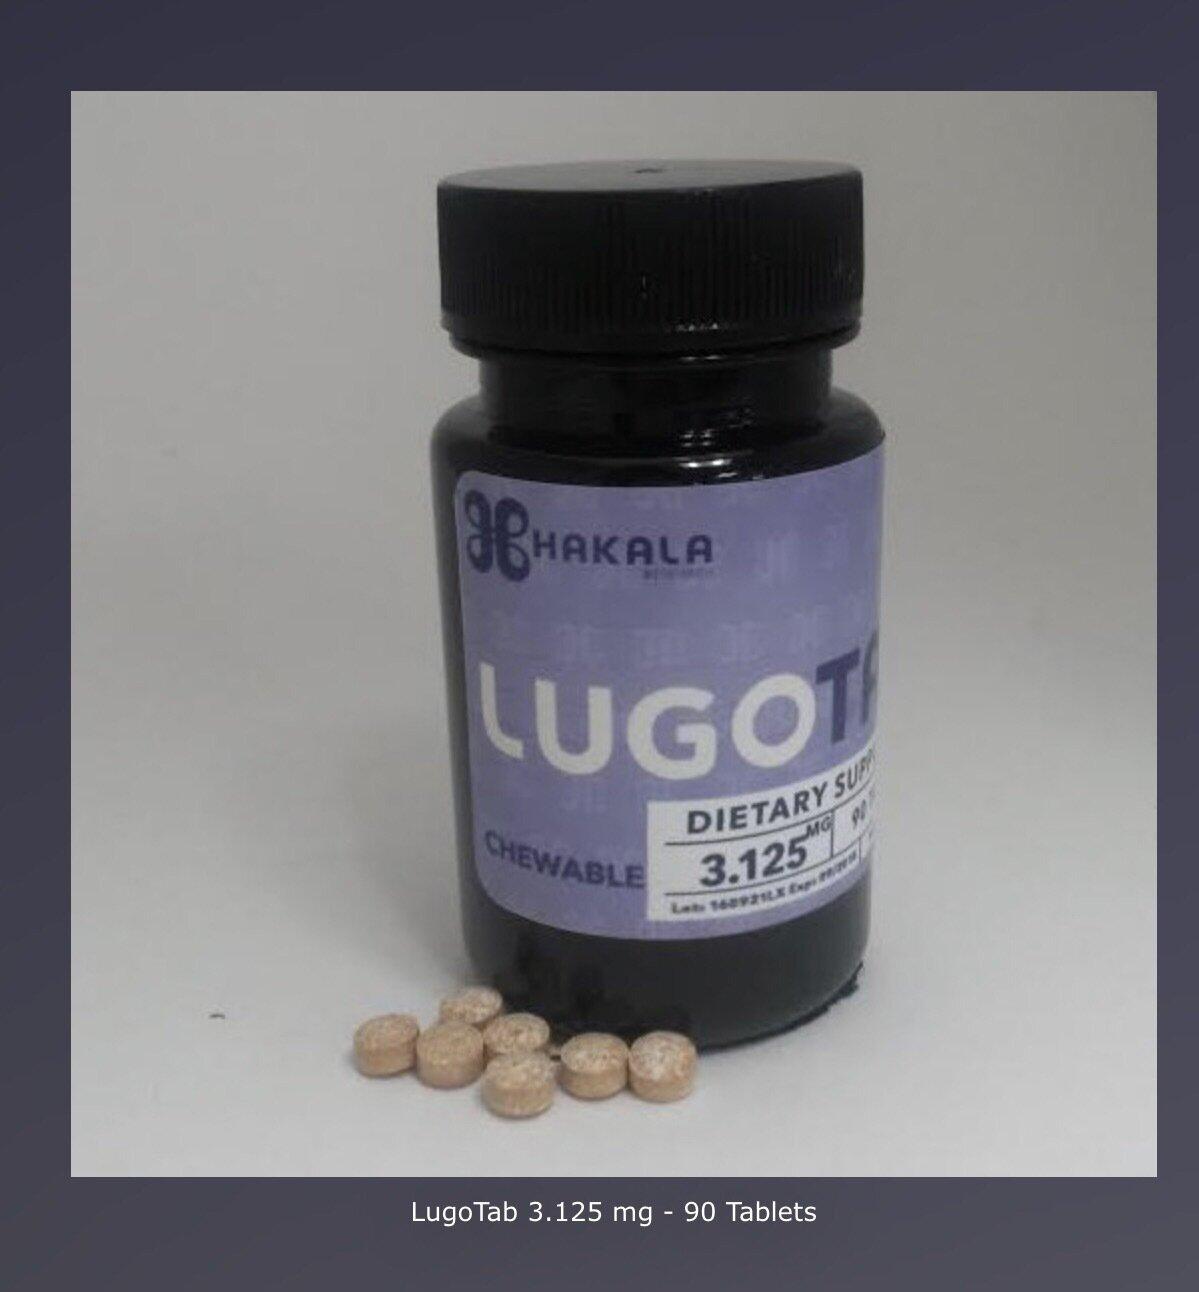 LugoTab 3.125 mg - 90 Tablets